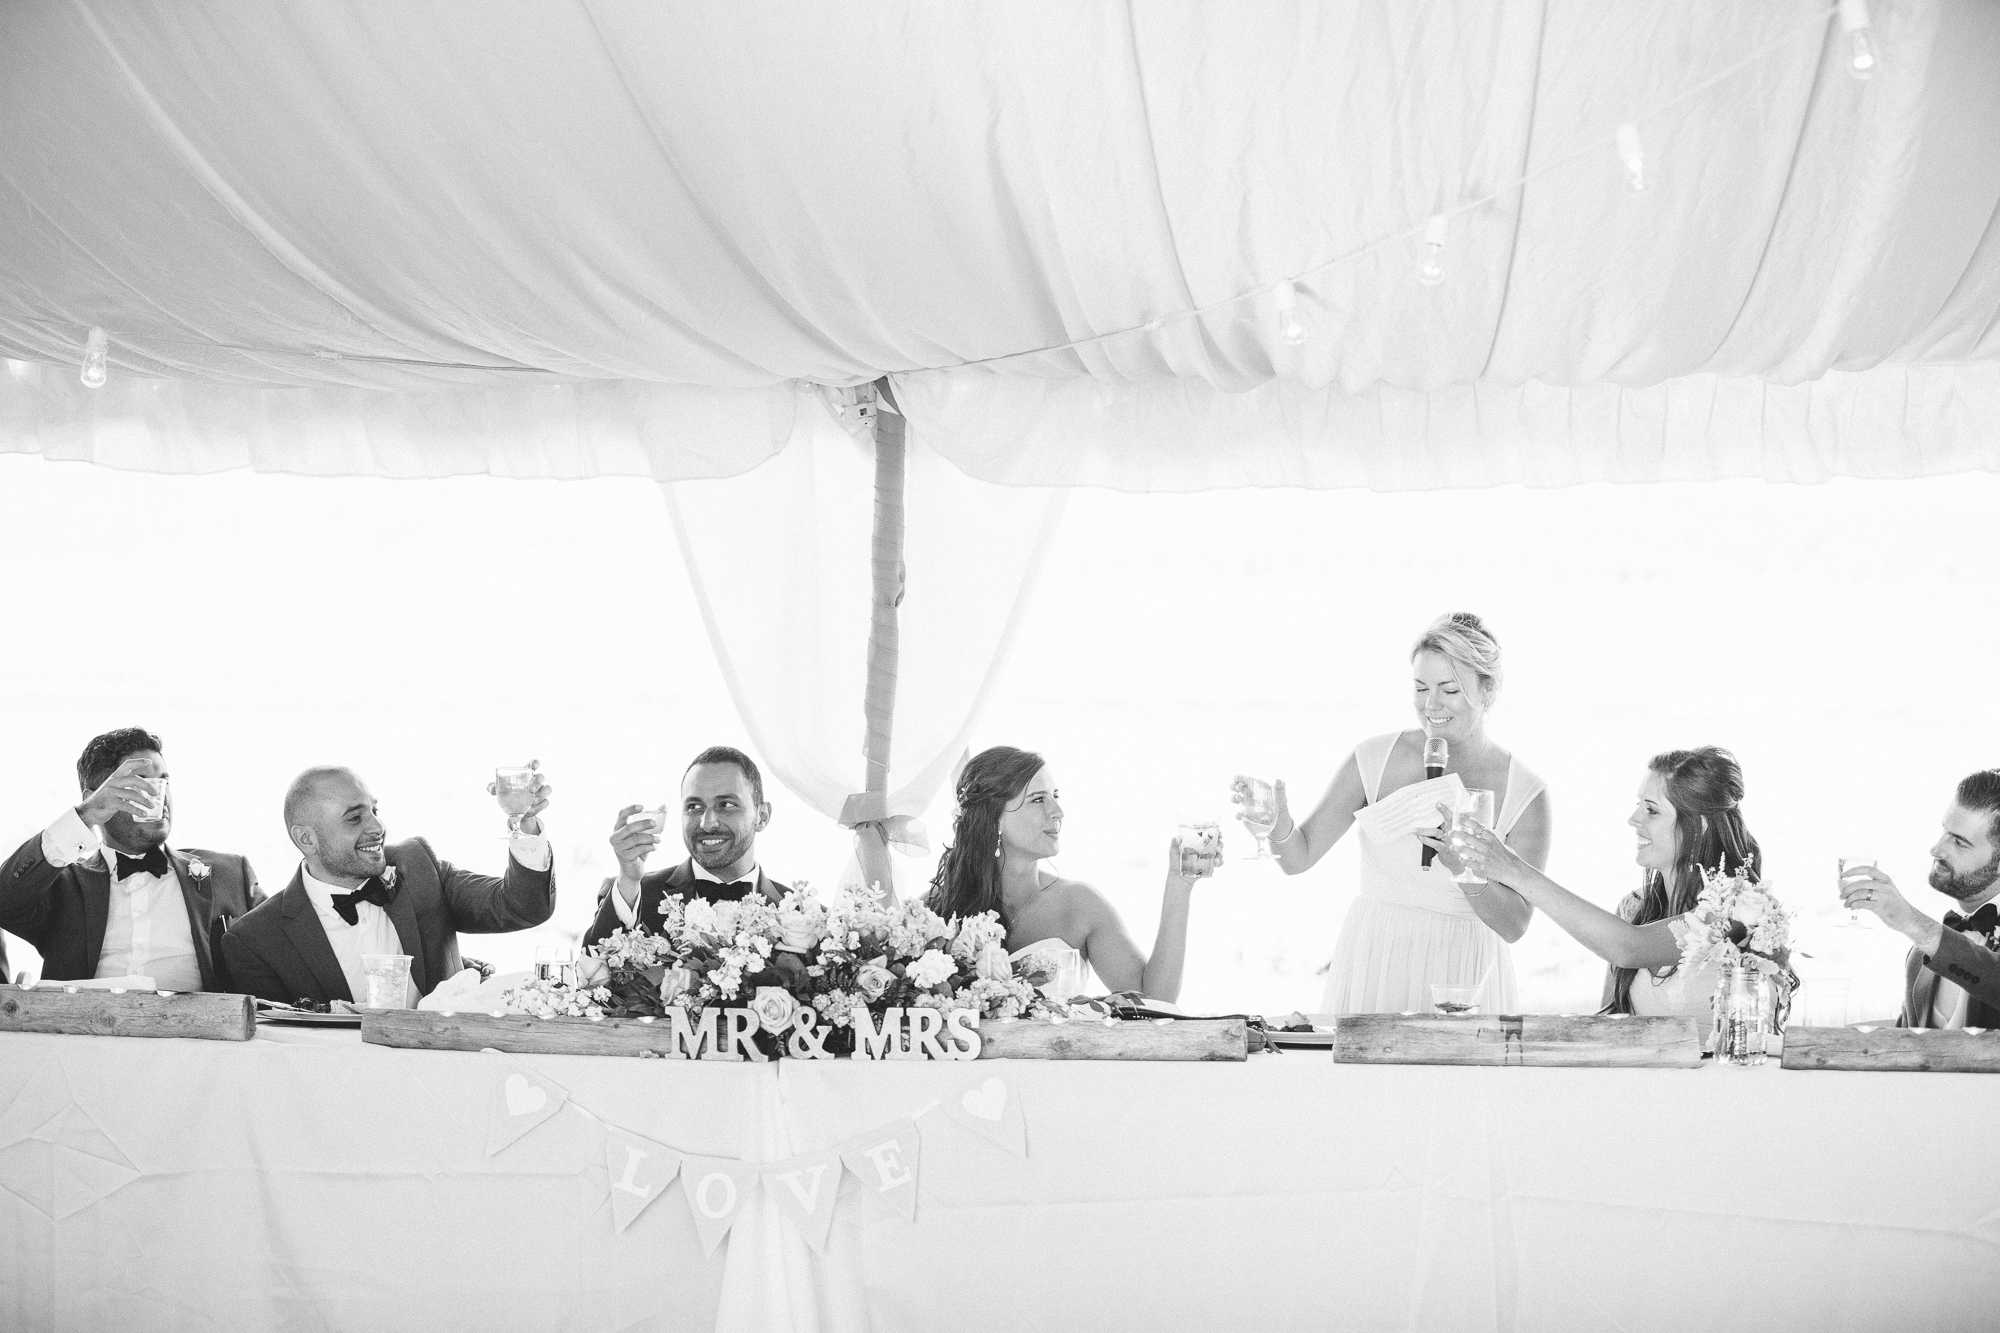 MP_16.06.19_Michael & Brittany Wedding-5969.jpg